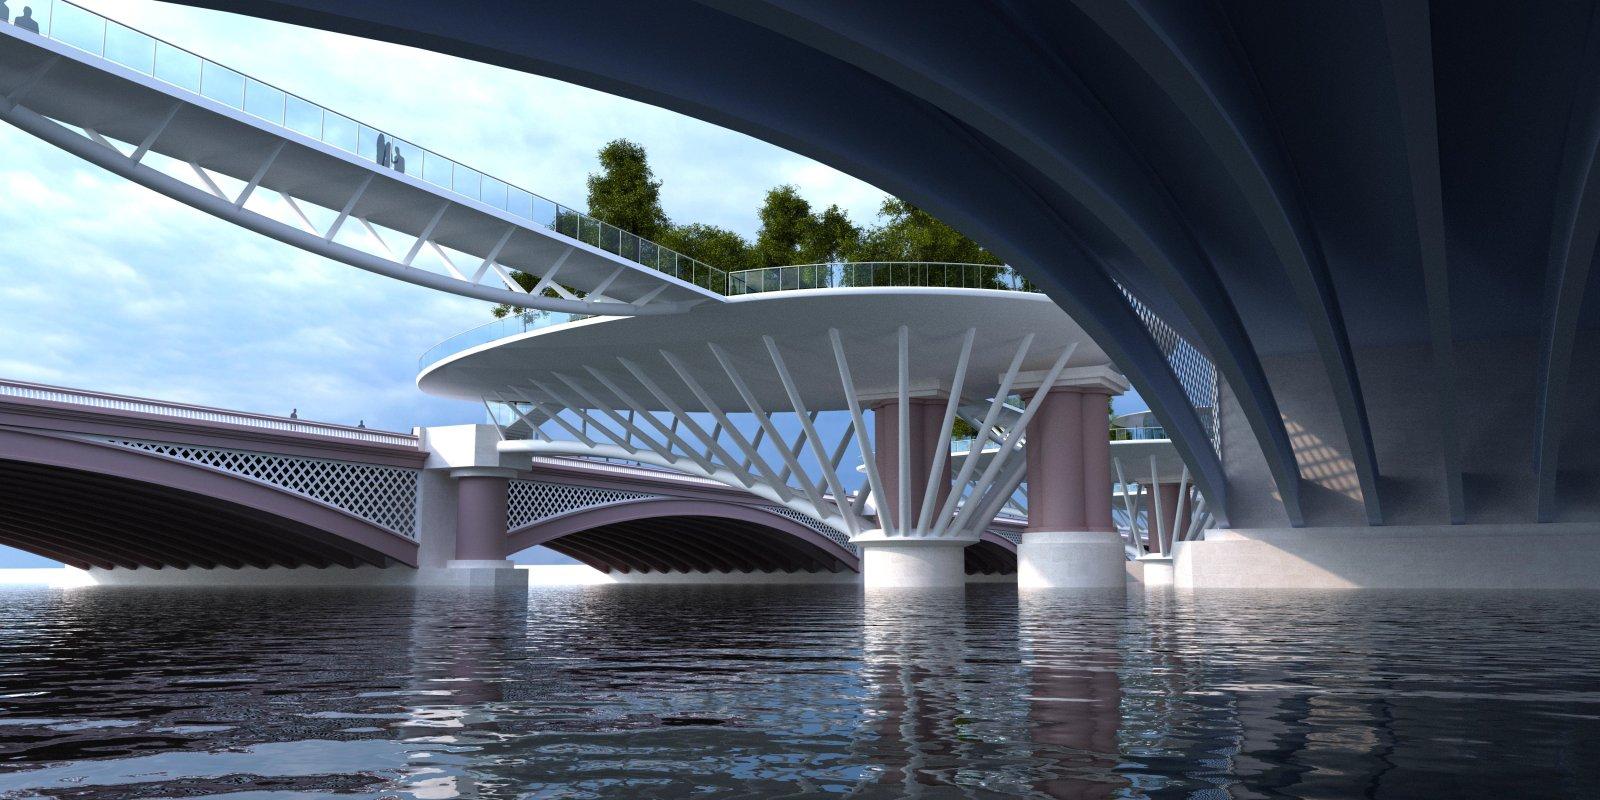 Blackfriars Garden Islands Bridge